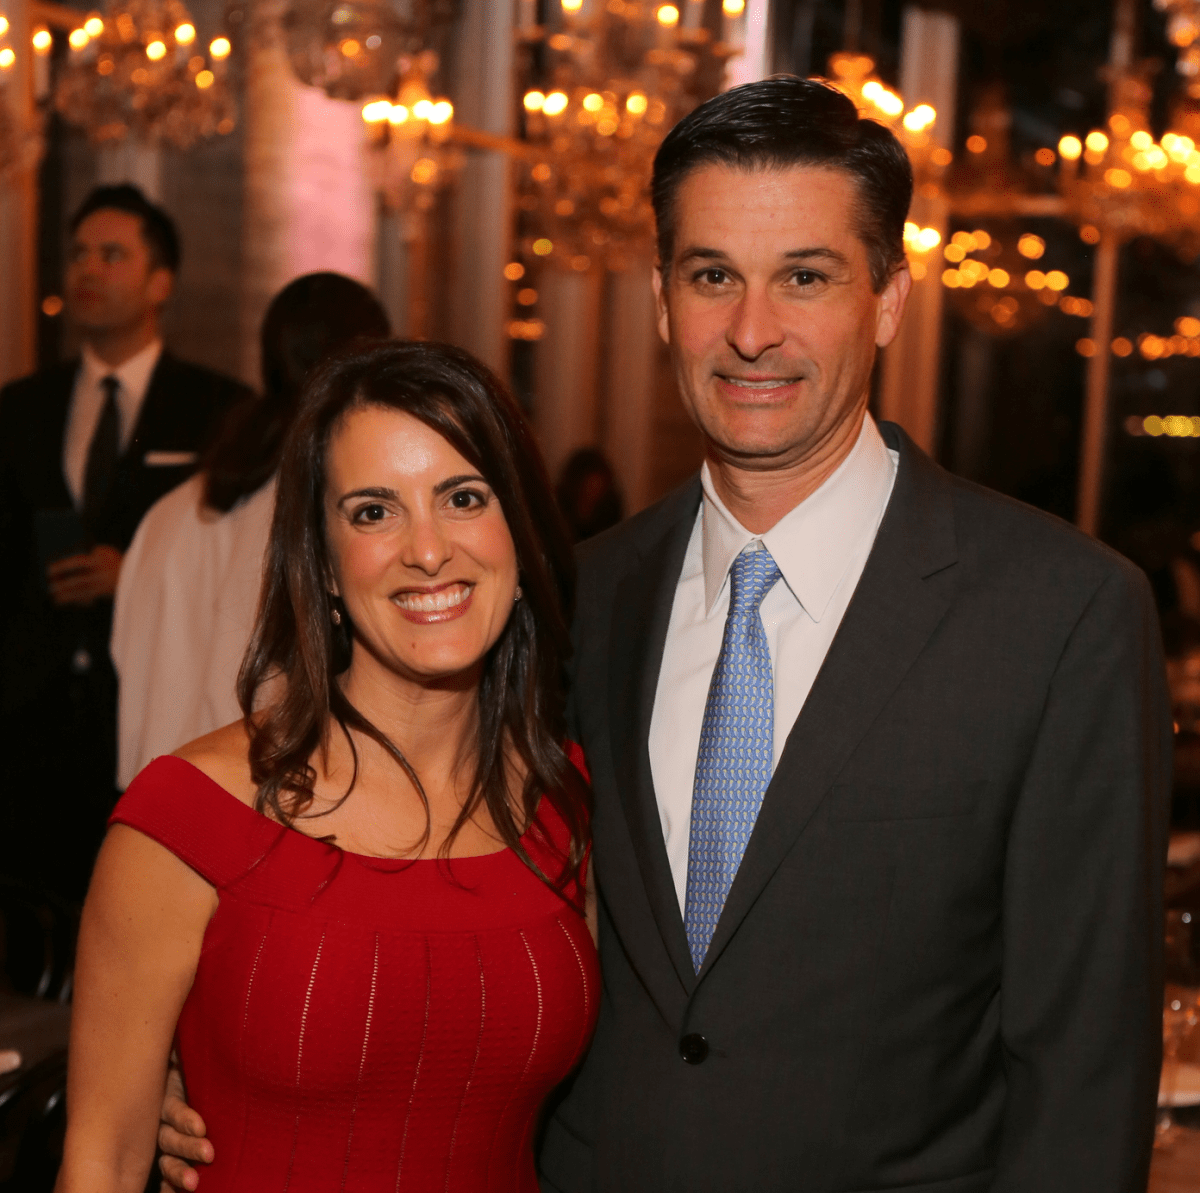 News, Equinox Opening Dinner, Dec. 2015, cute couple